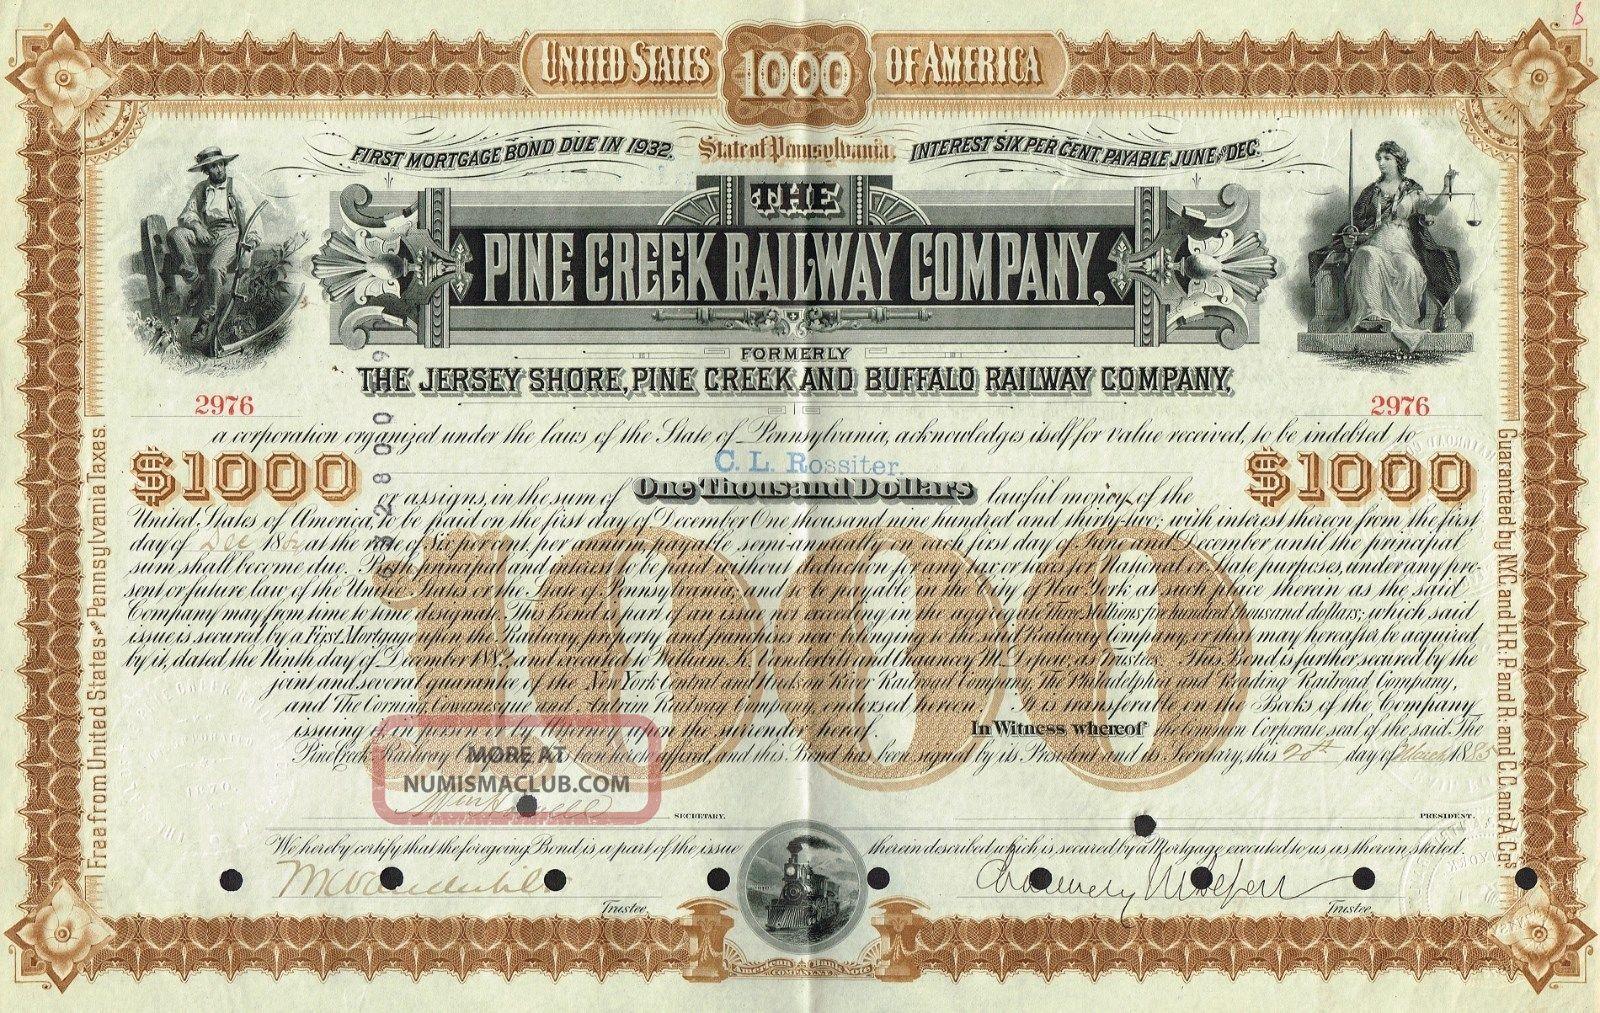 Usa Pine Creek Railway Company Stock Certificate Signed By Vanderbilt & Depew World photo